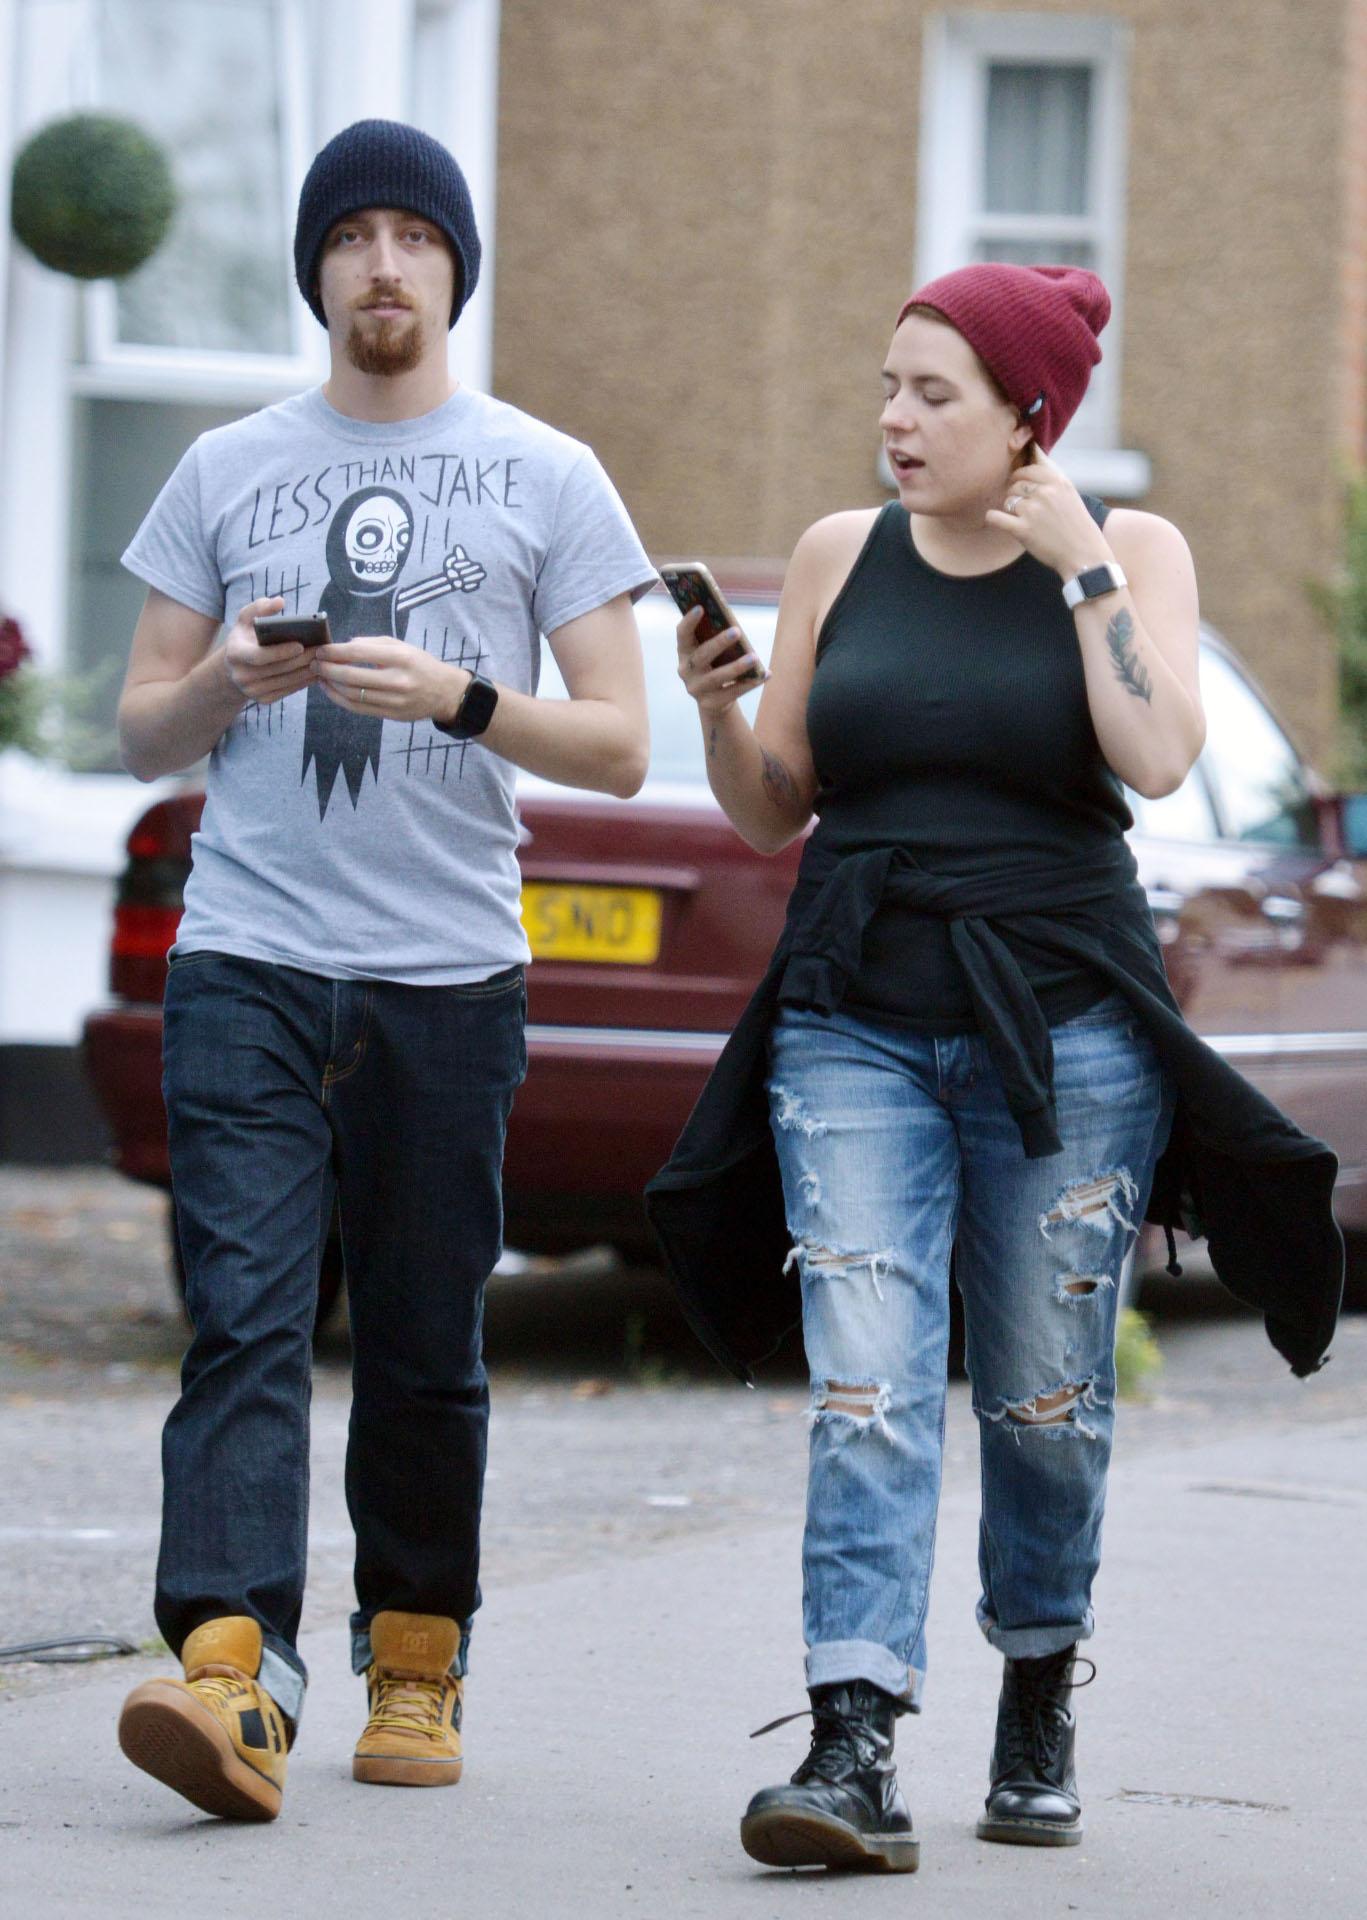 Bella Cruise z mężem w 2015 roku, fot. LN1 / Backgrid UK / Forum